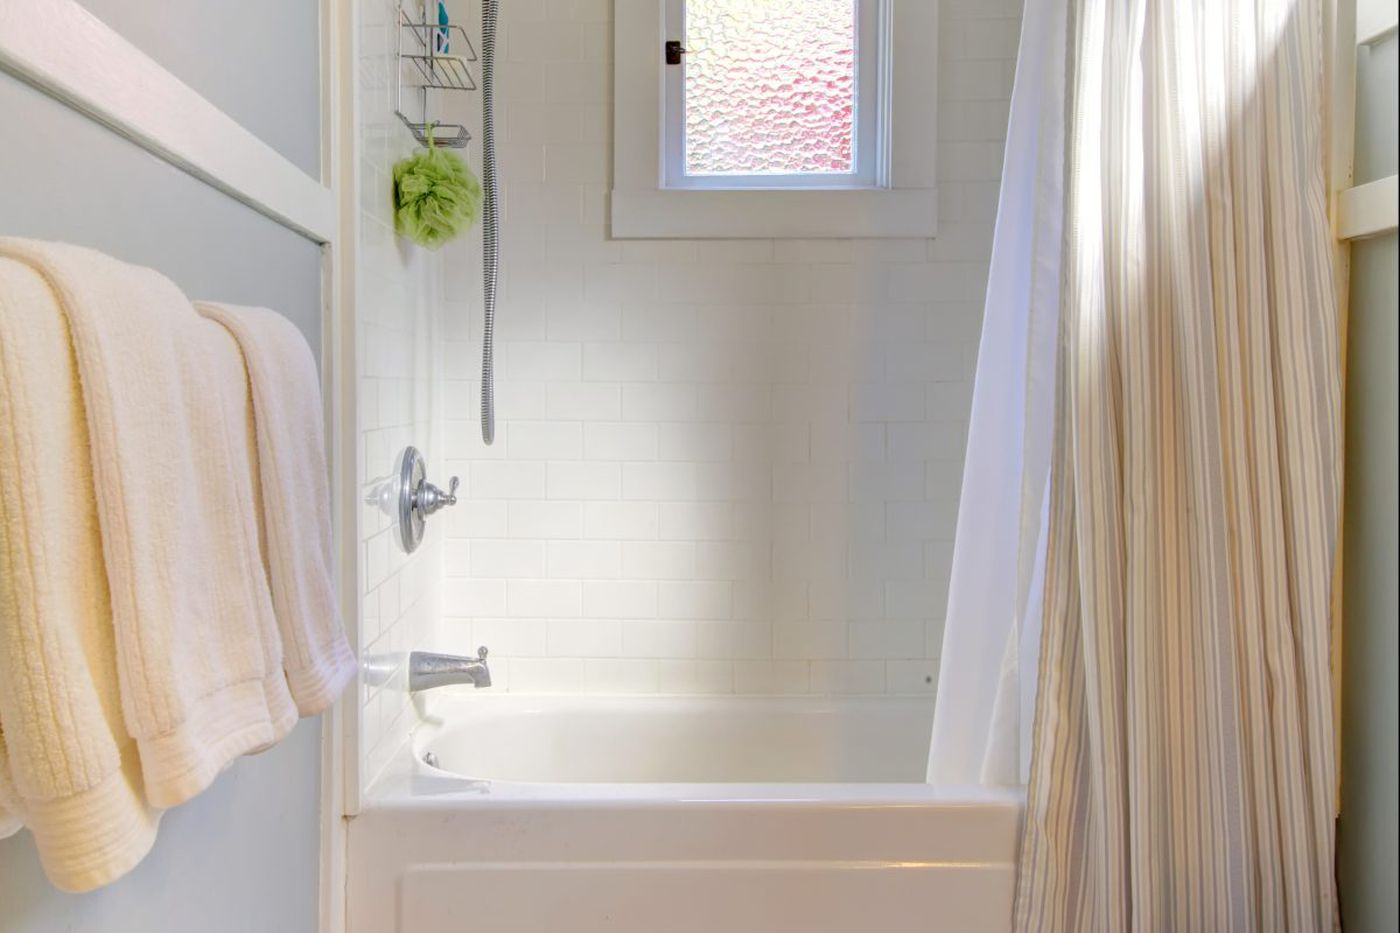 Ask Jennifer Adams Inexpensive Tile Alternatives For Bathroom Updates - Cheap bathroom tile alternatives